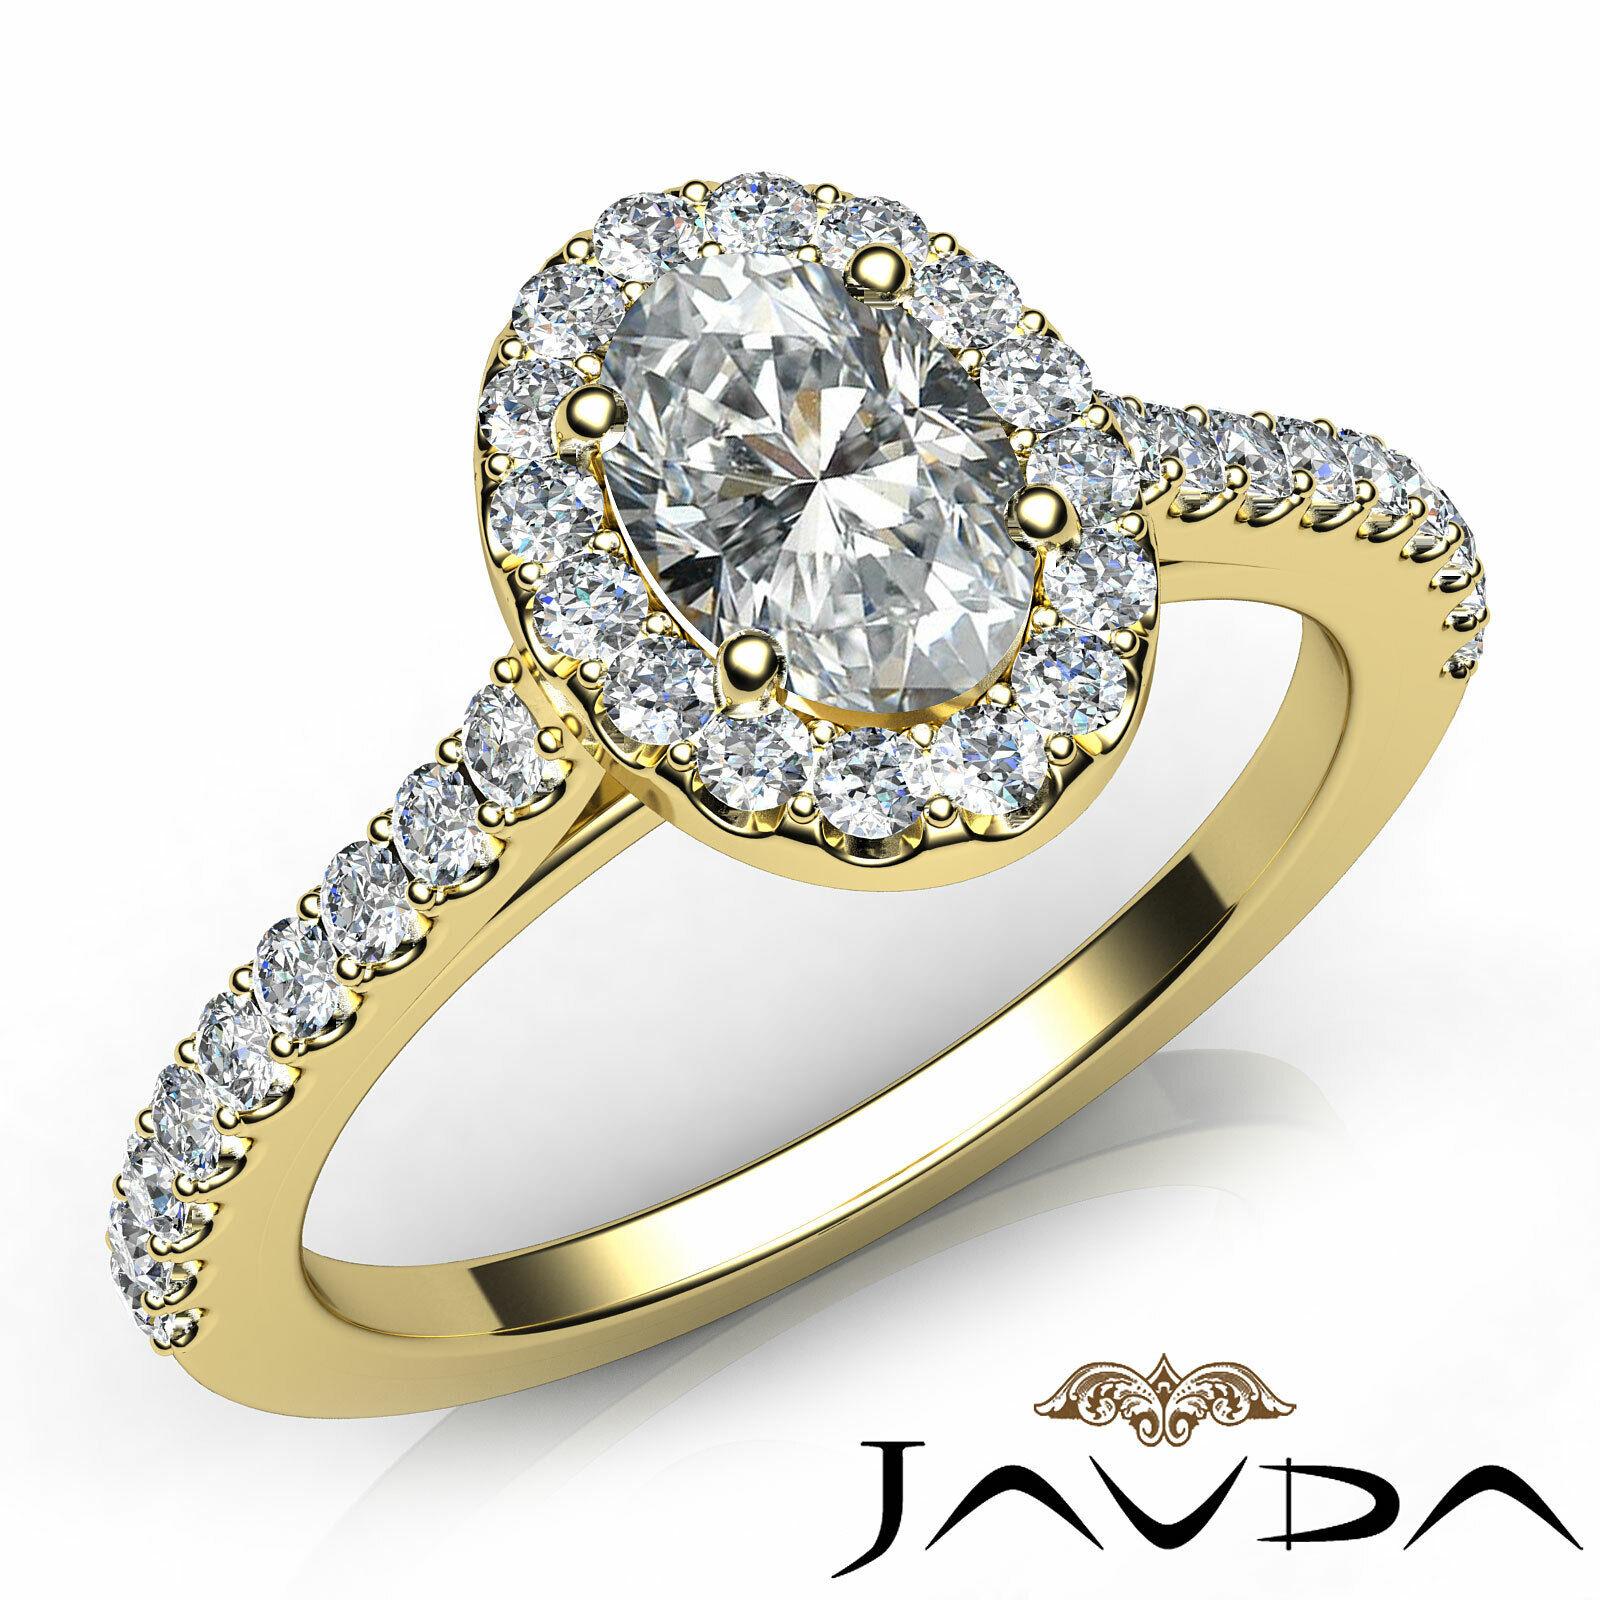 1.6ctw Prong Setting Oval Diamond Engagement Ring GIA H-VS1 White Gold Women New 7